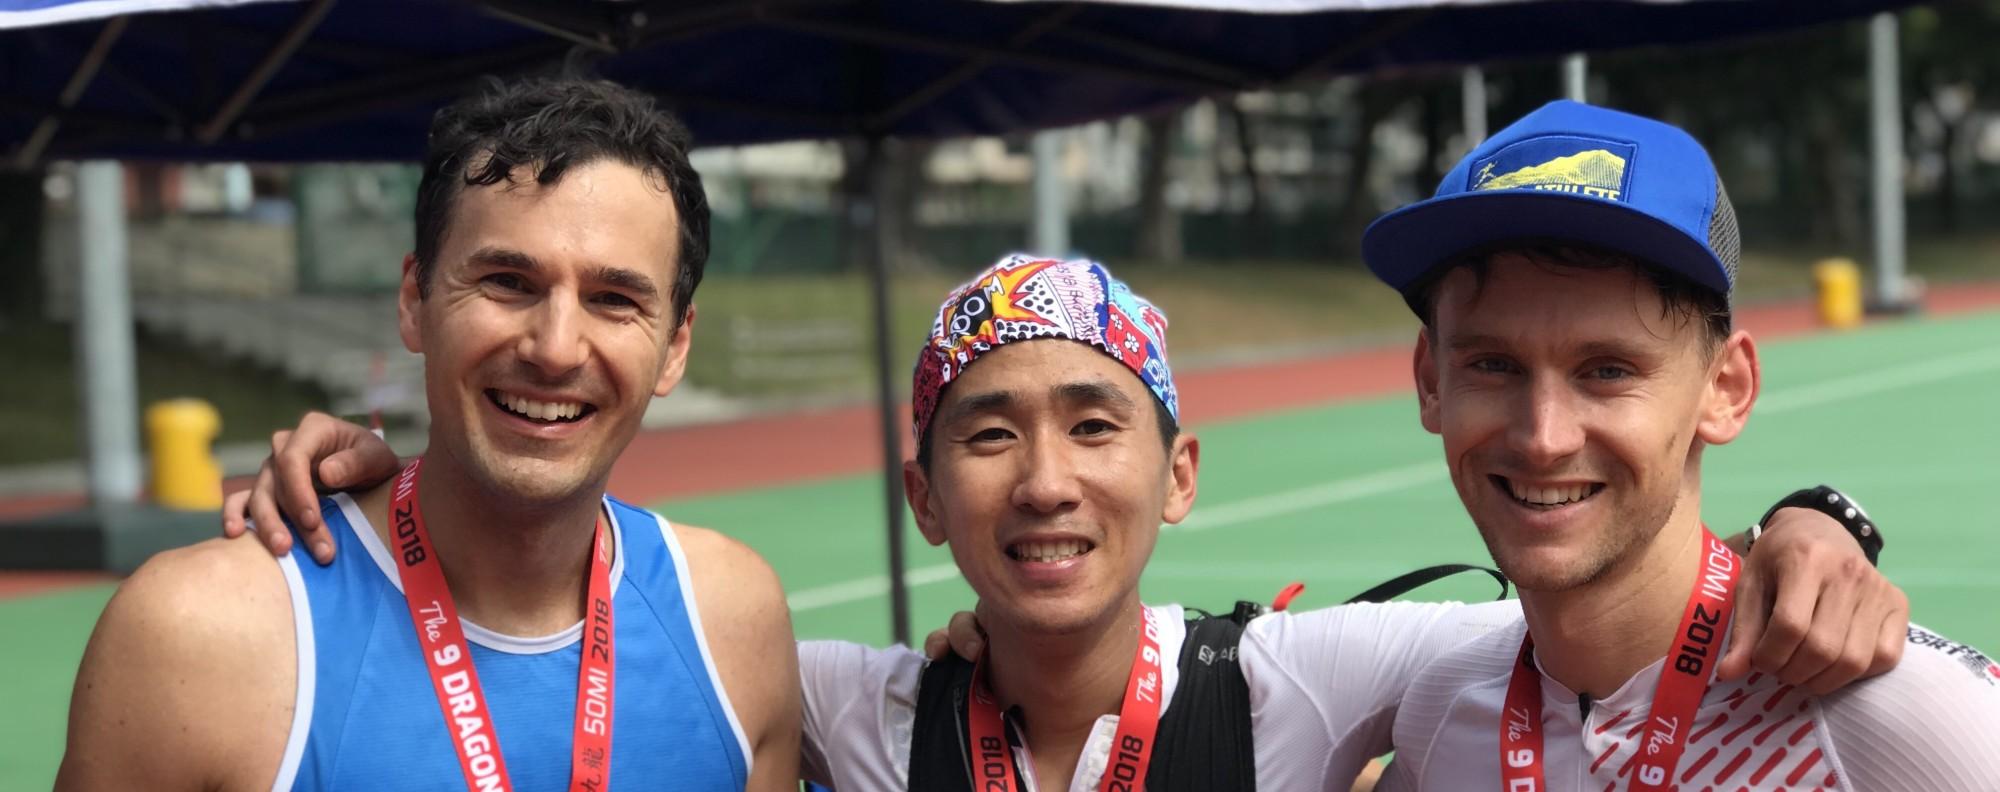 The first three runners in the men's 50-mile 9 Dragons ultra: Michael Skobierski, Deng Goumin and Harry Jones. Photo: Mark Agnew